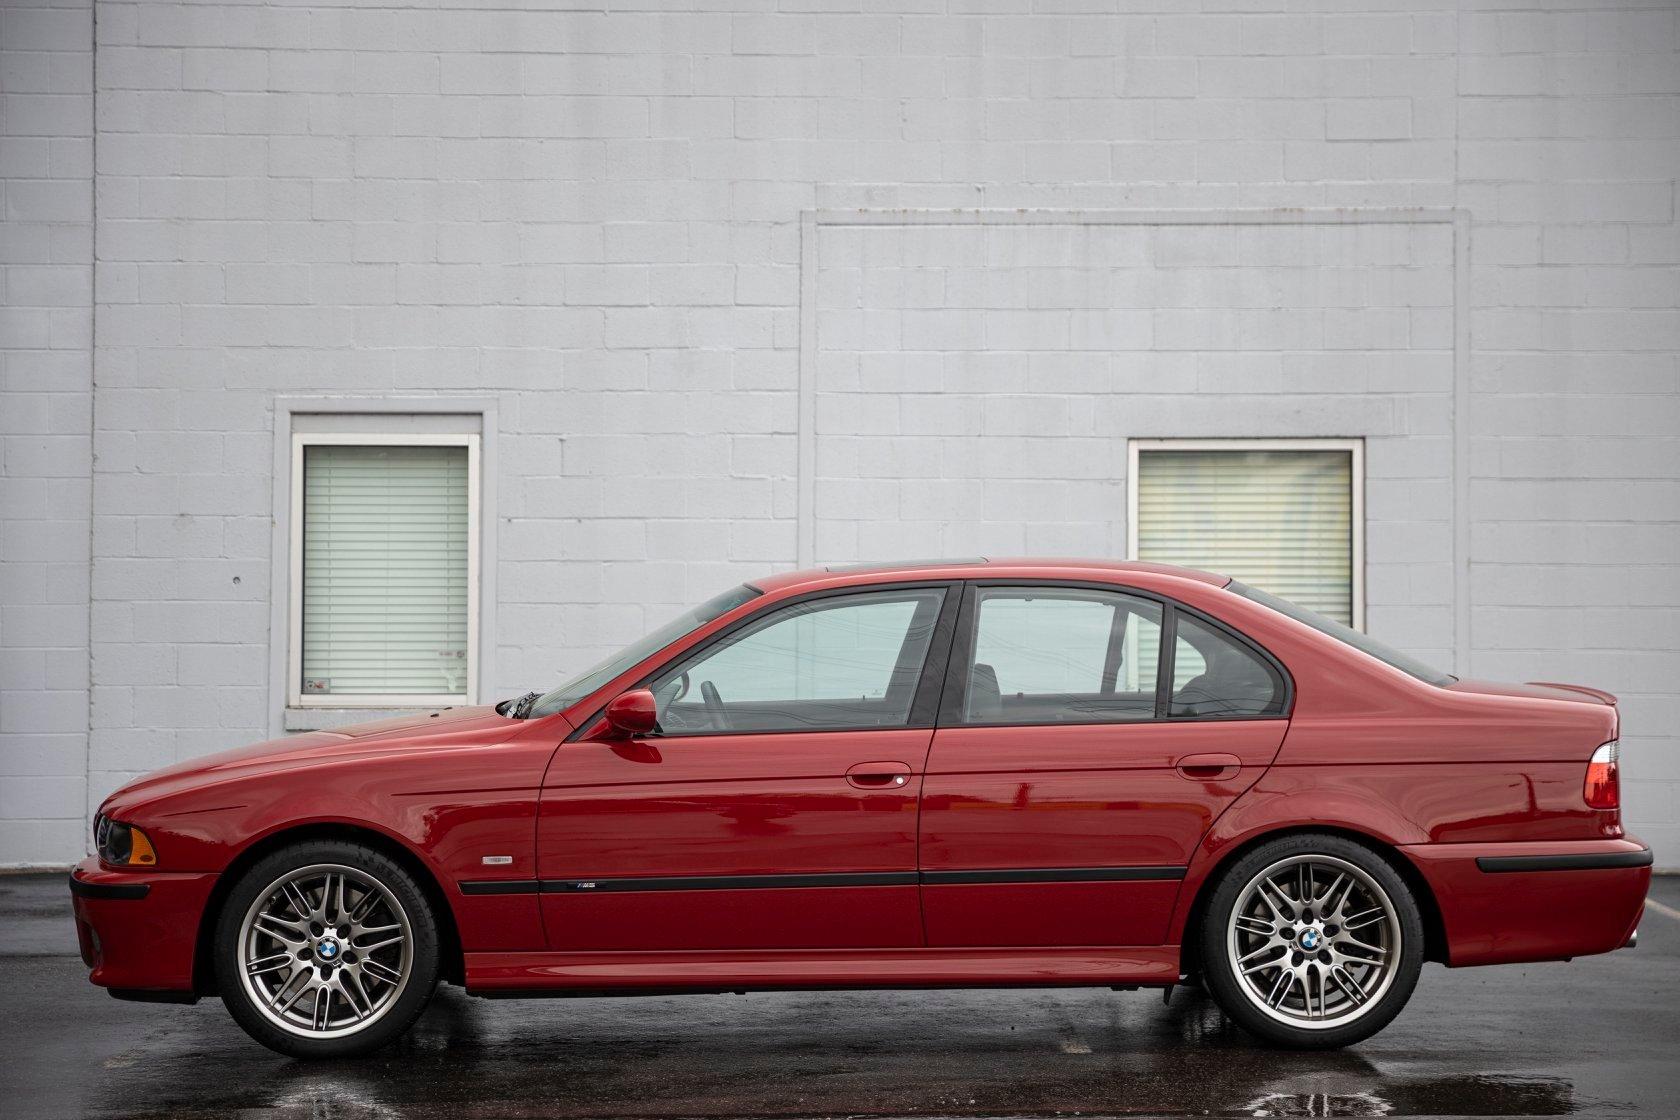 BMW_M5_E39_Imola_Red_0010